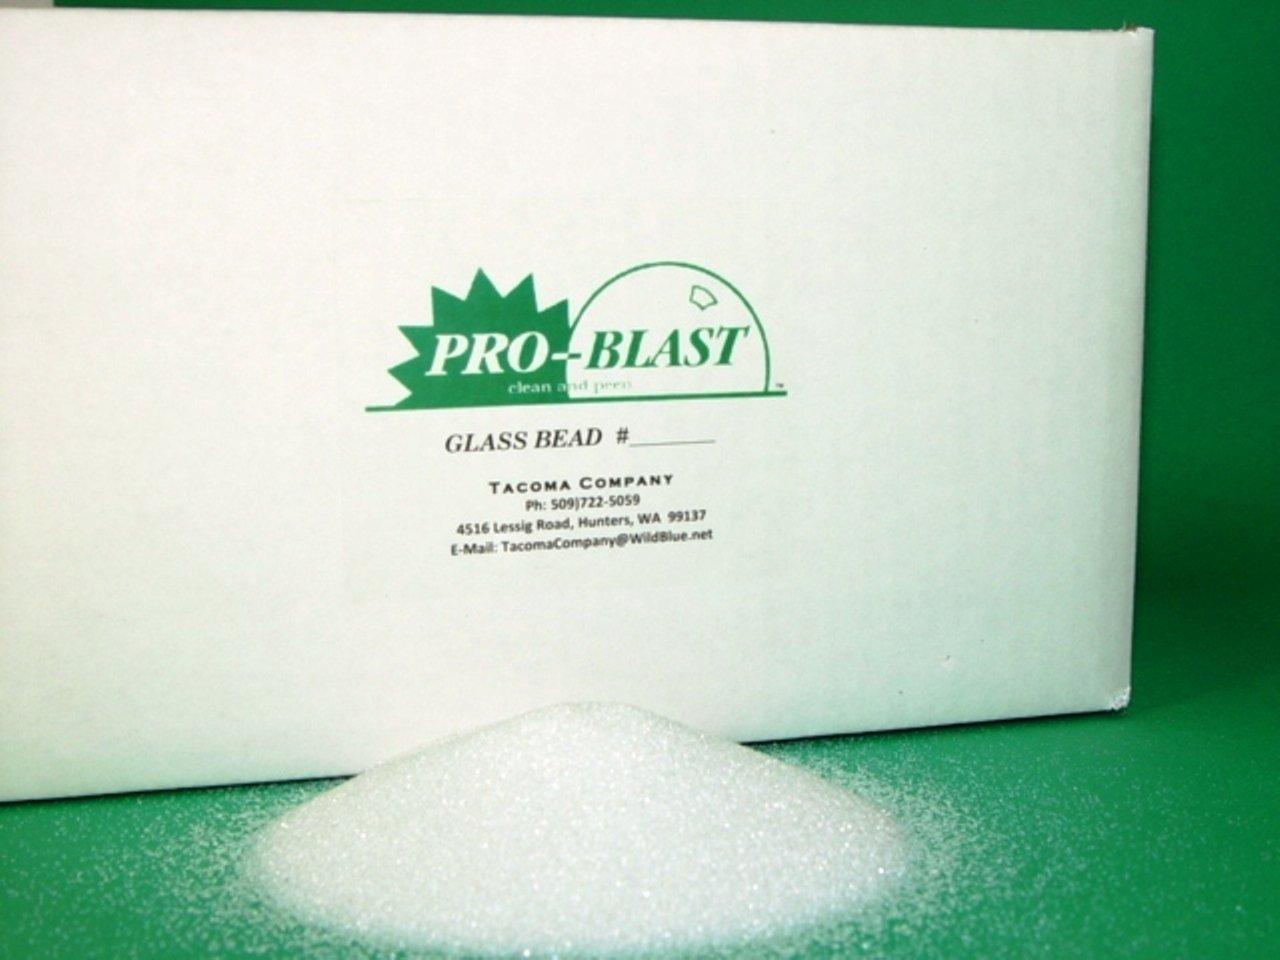 GLASS BEAD #3 - Large Diameter Bead - 25 lbs. - Sand Blast Cabinet ...